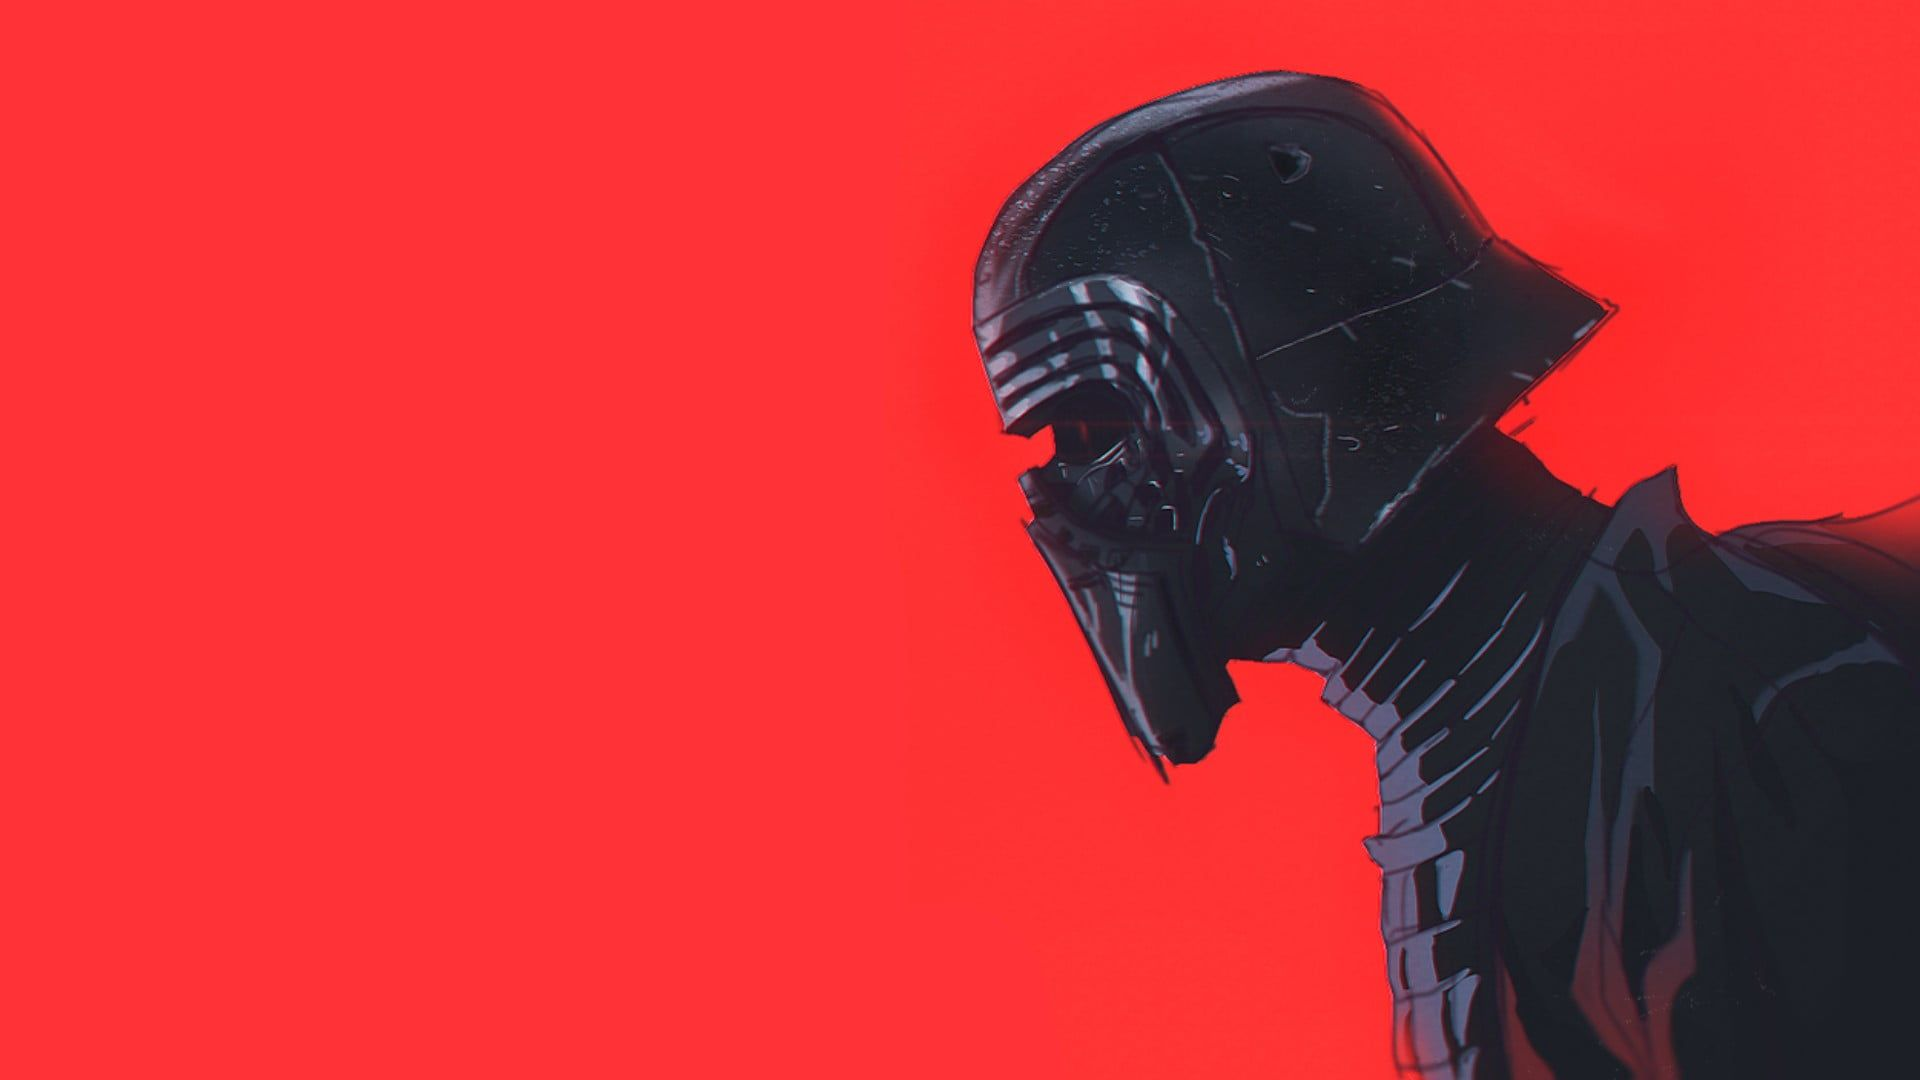 Dart Vader Illustration Kylo Ren Star Wars Mask Red 1080p Wallpaper Hdwallpaper Desktop Kylo Ren Wallpaper Star Wars Wallpaper Star Wars Art